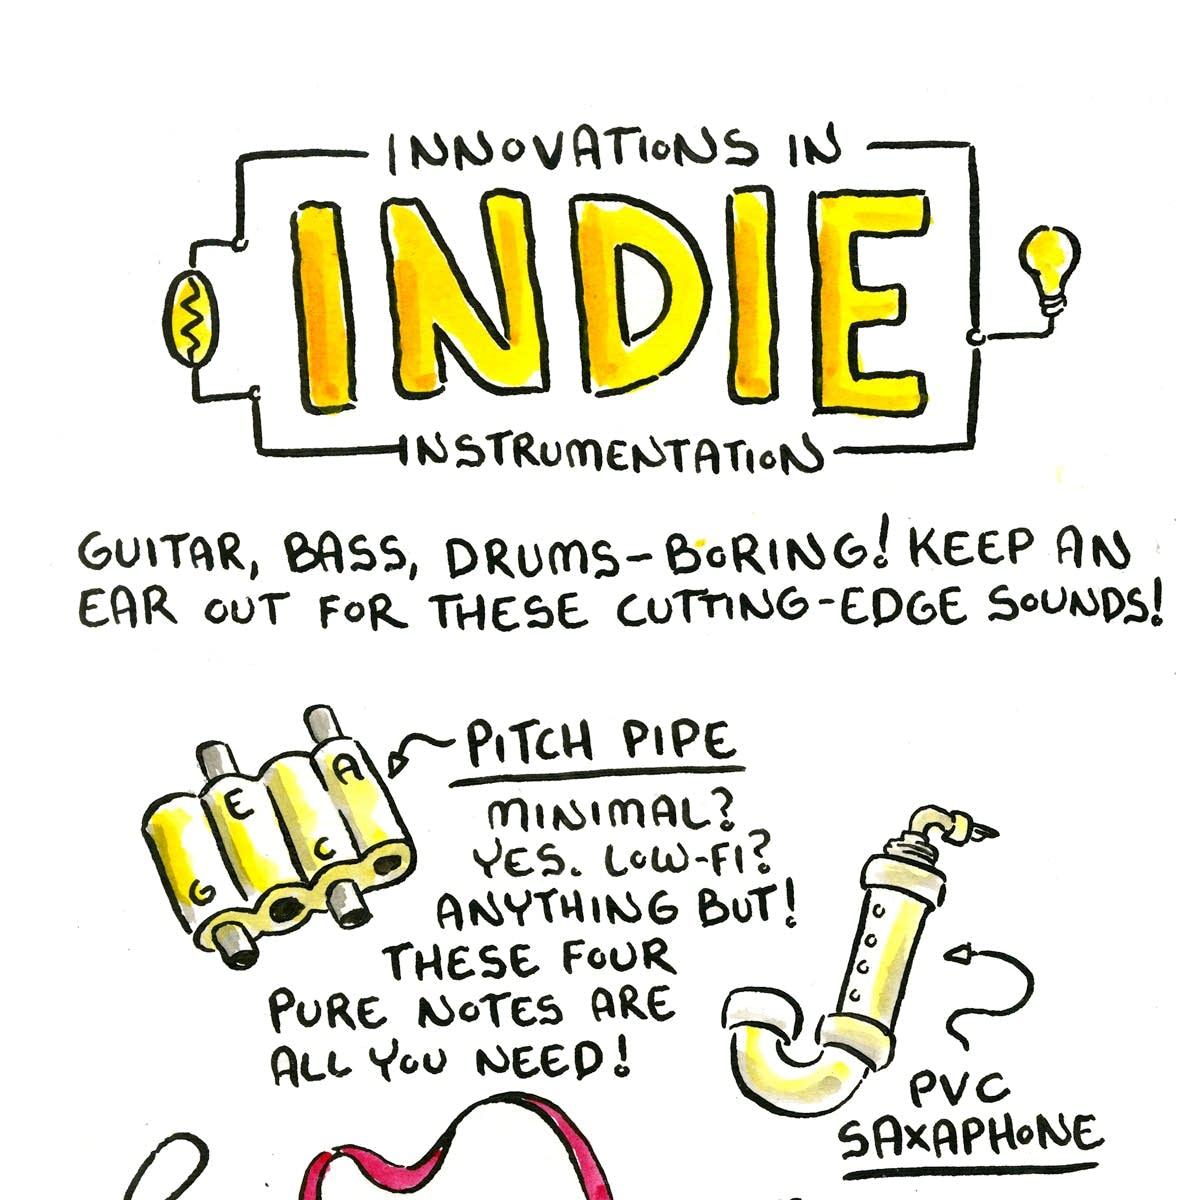 Comic anders instrumentation